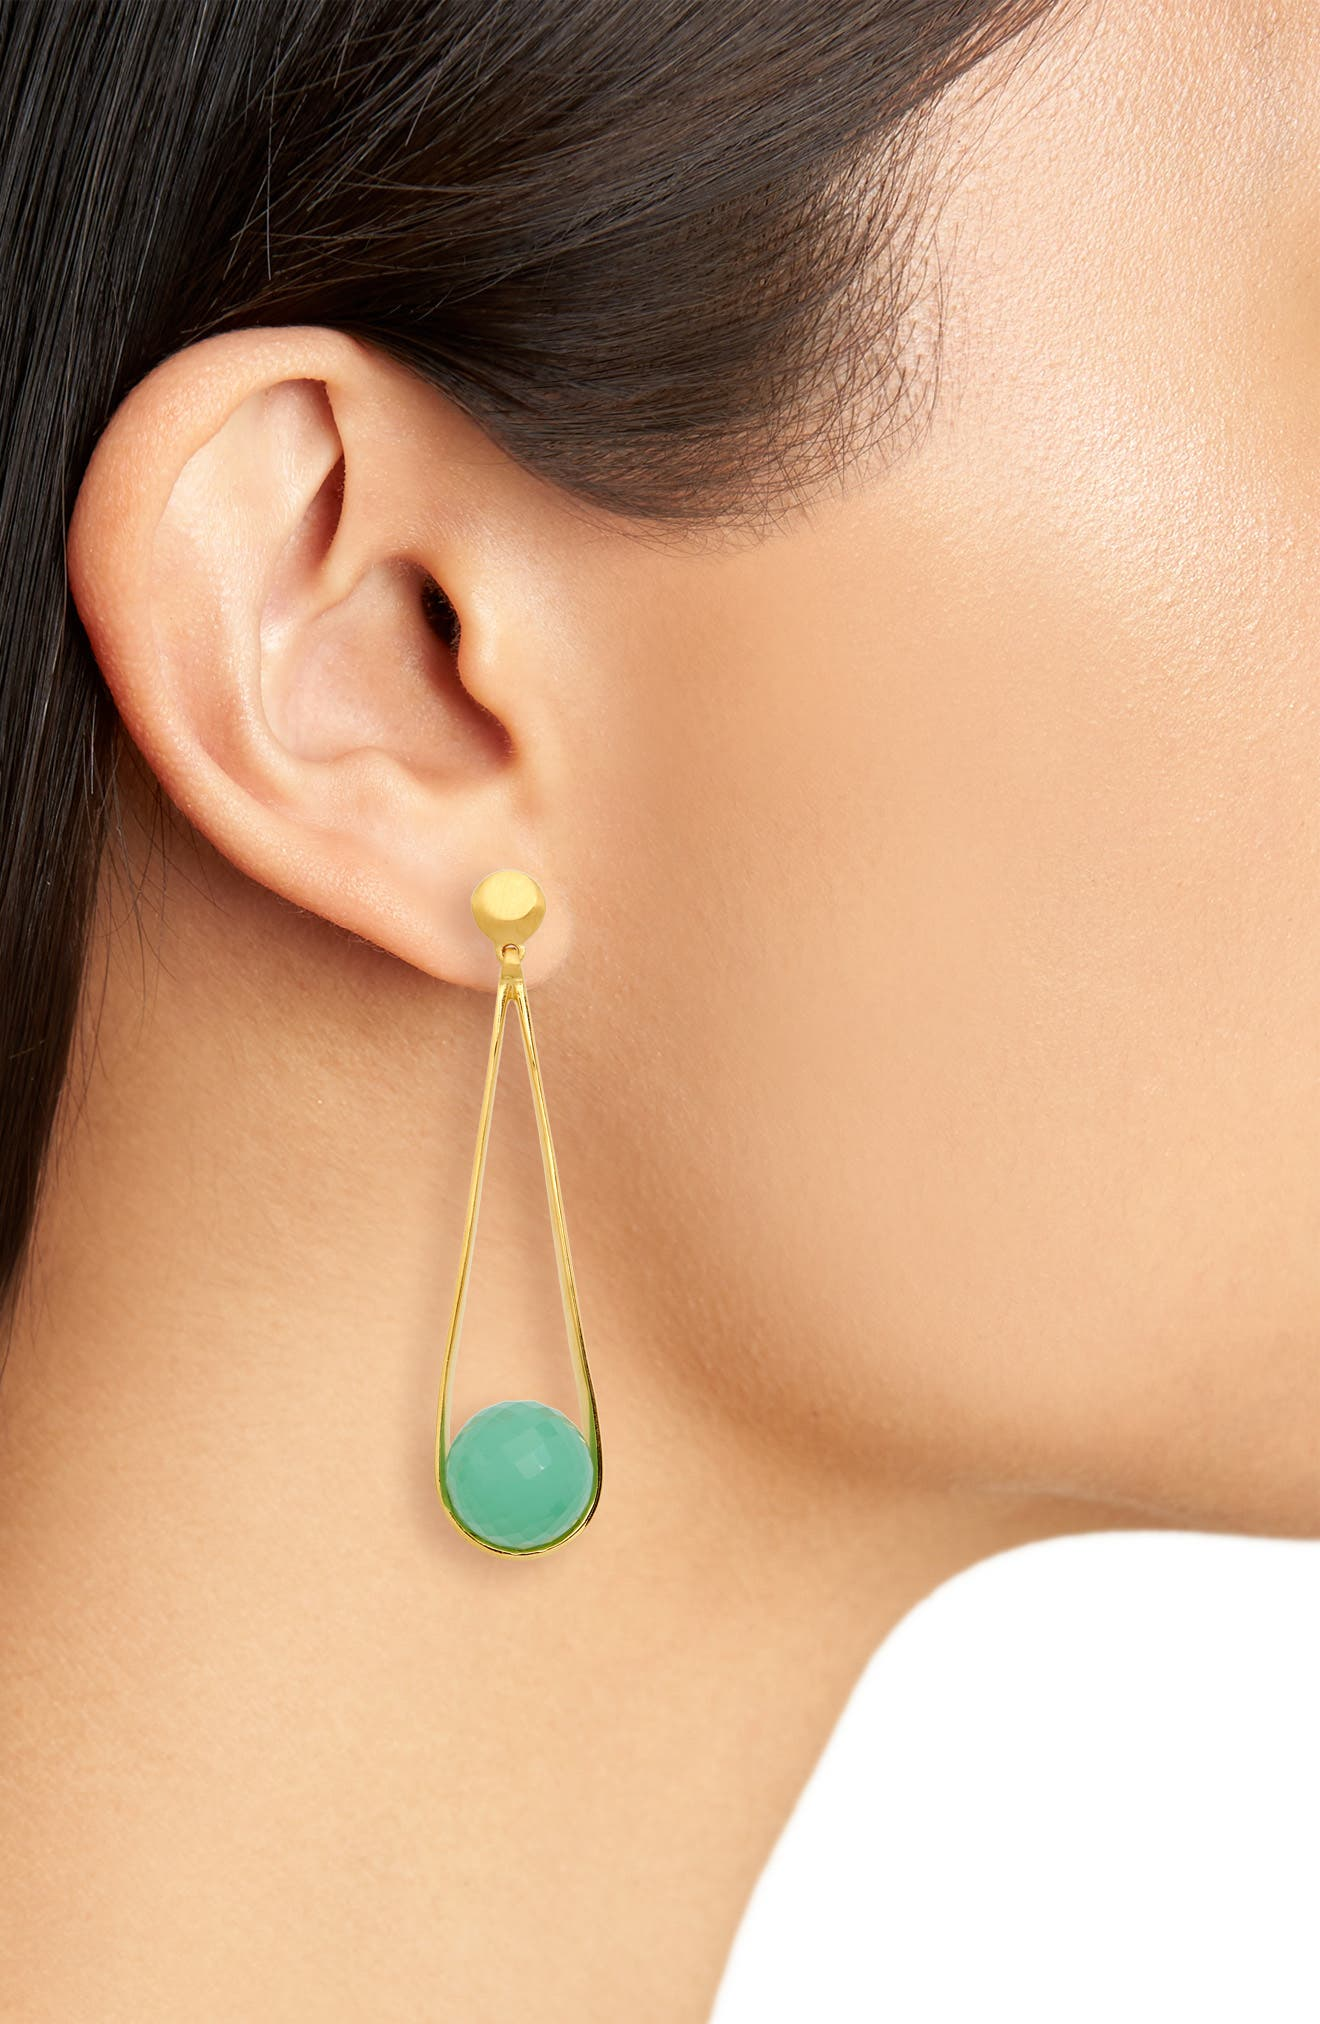 Ipanema Earrings,                             Alternate thumbnail 2, color,                             Ocean Blue Chalcedony/ Gold